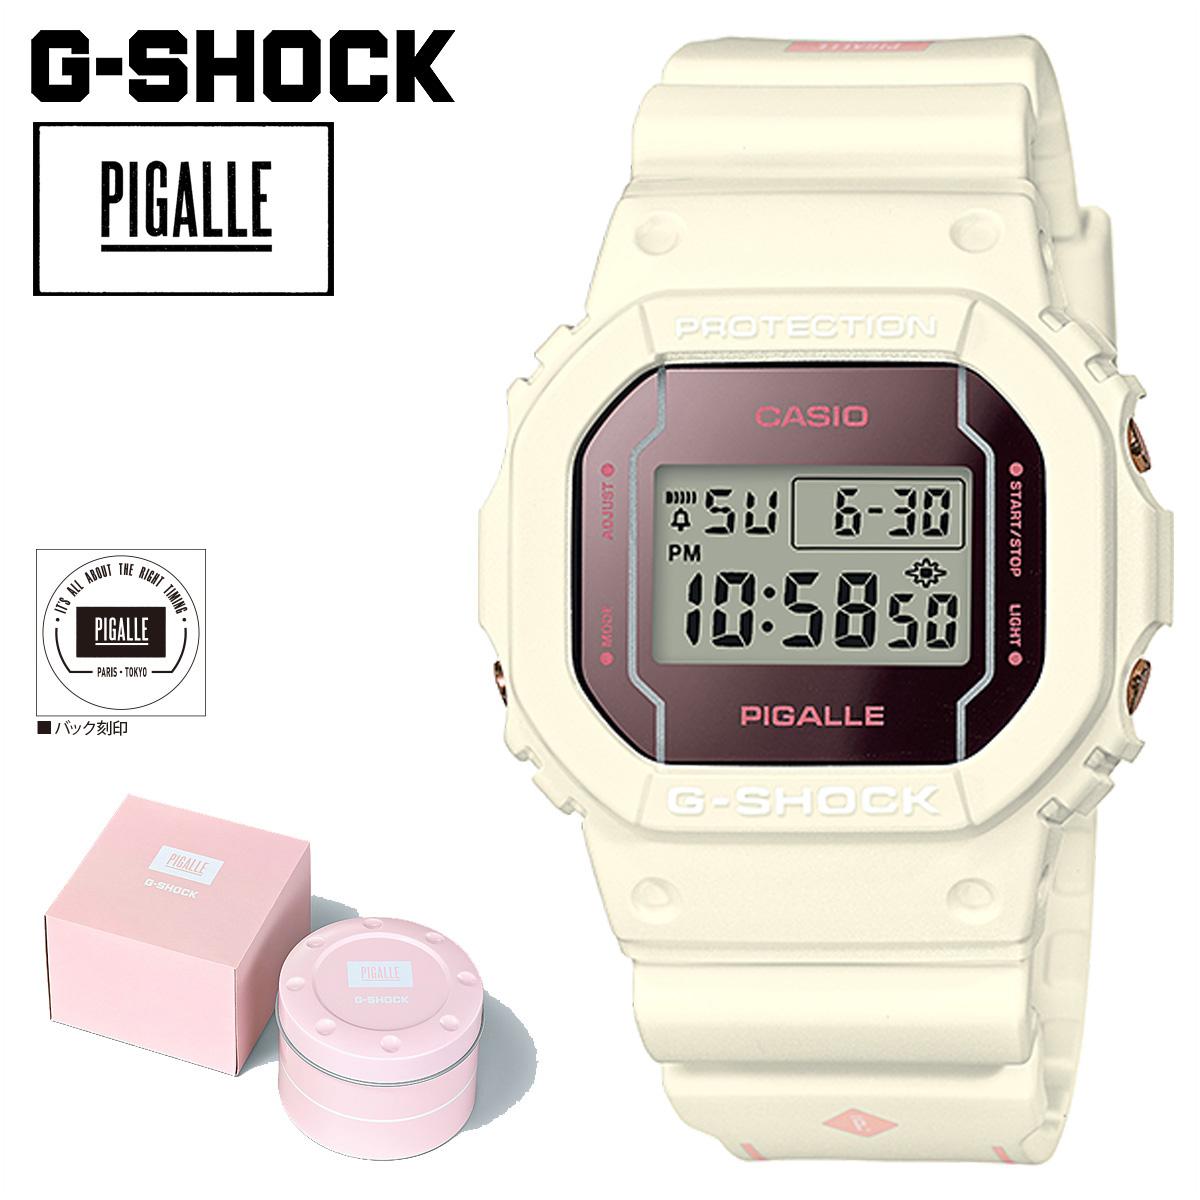 Casio Casio G Shock Watch ピガール Dw 5600pgw 7jr Pigalle ジーショック G Shock G Shock Men Gap Dis White White 8 22 Reentry Load